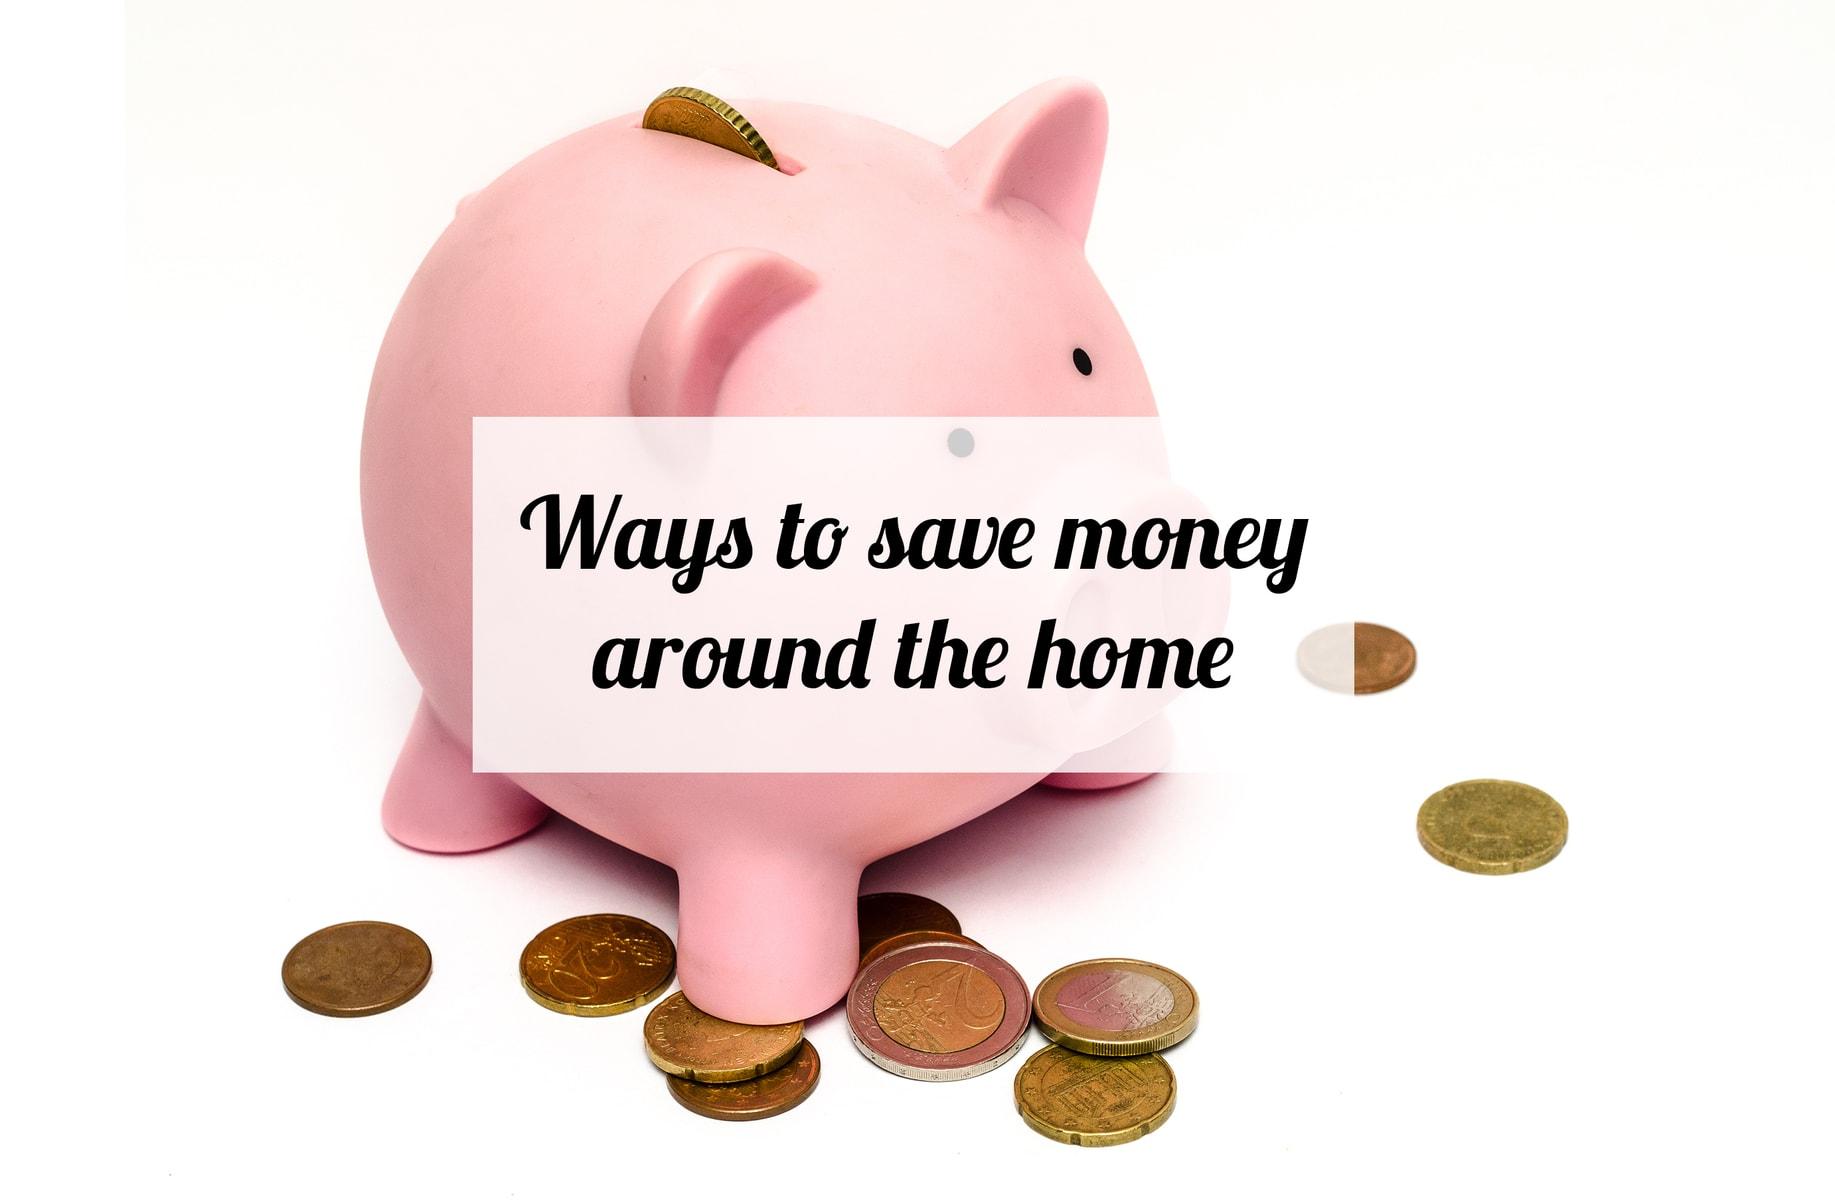 save-money-around-the-home